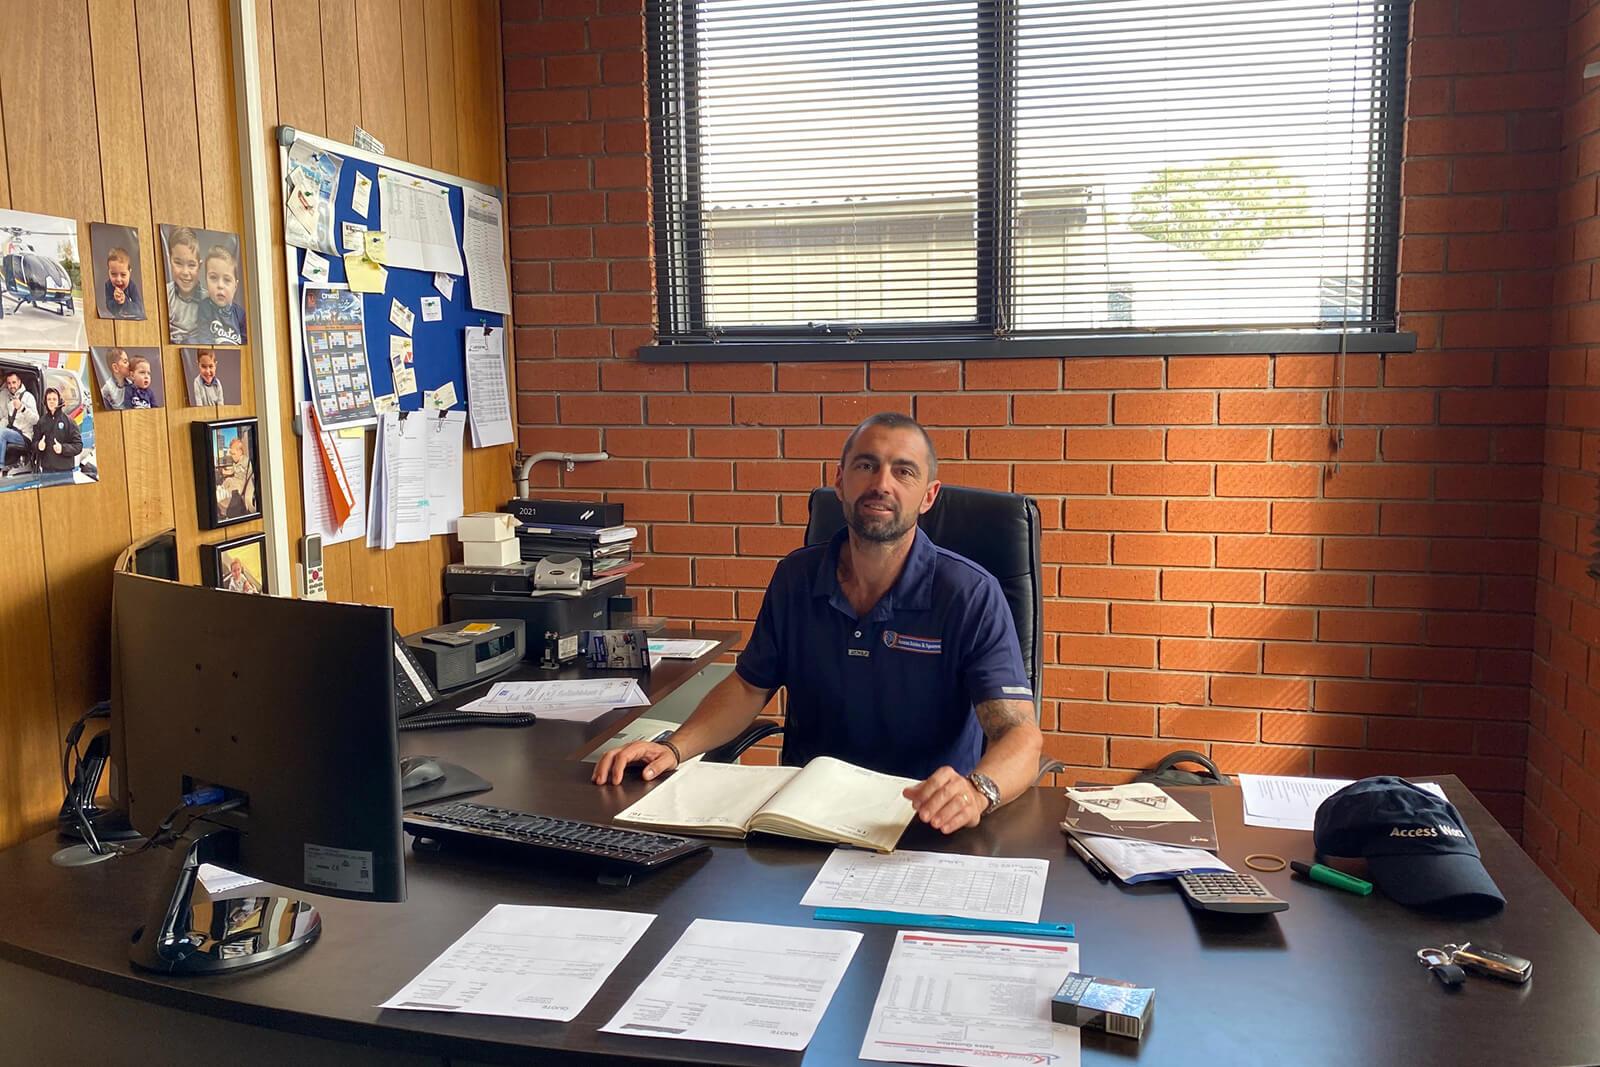 Darren_Baxter_office_Australia